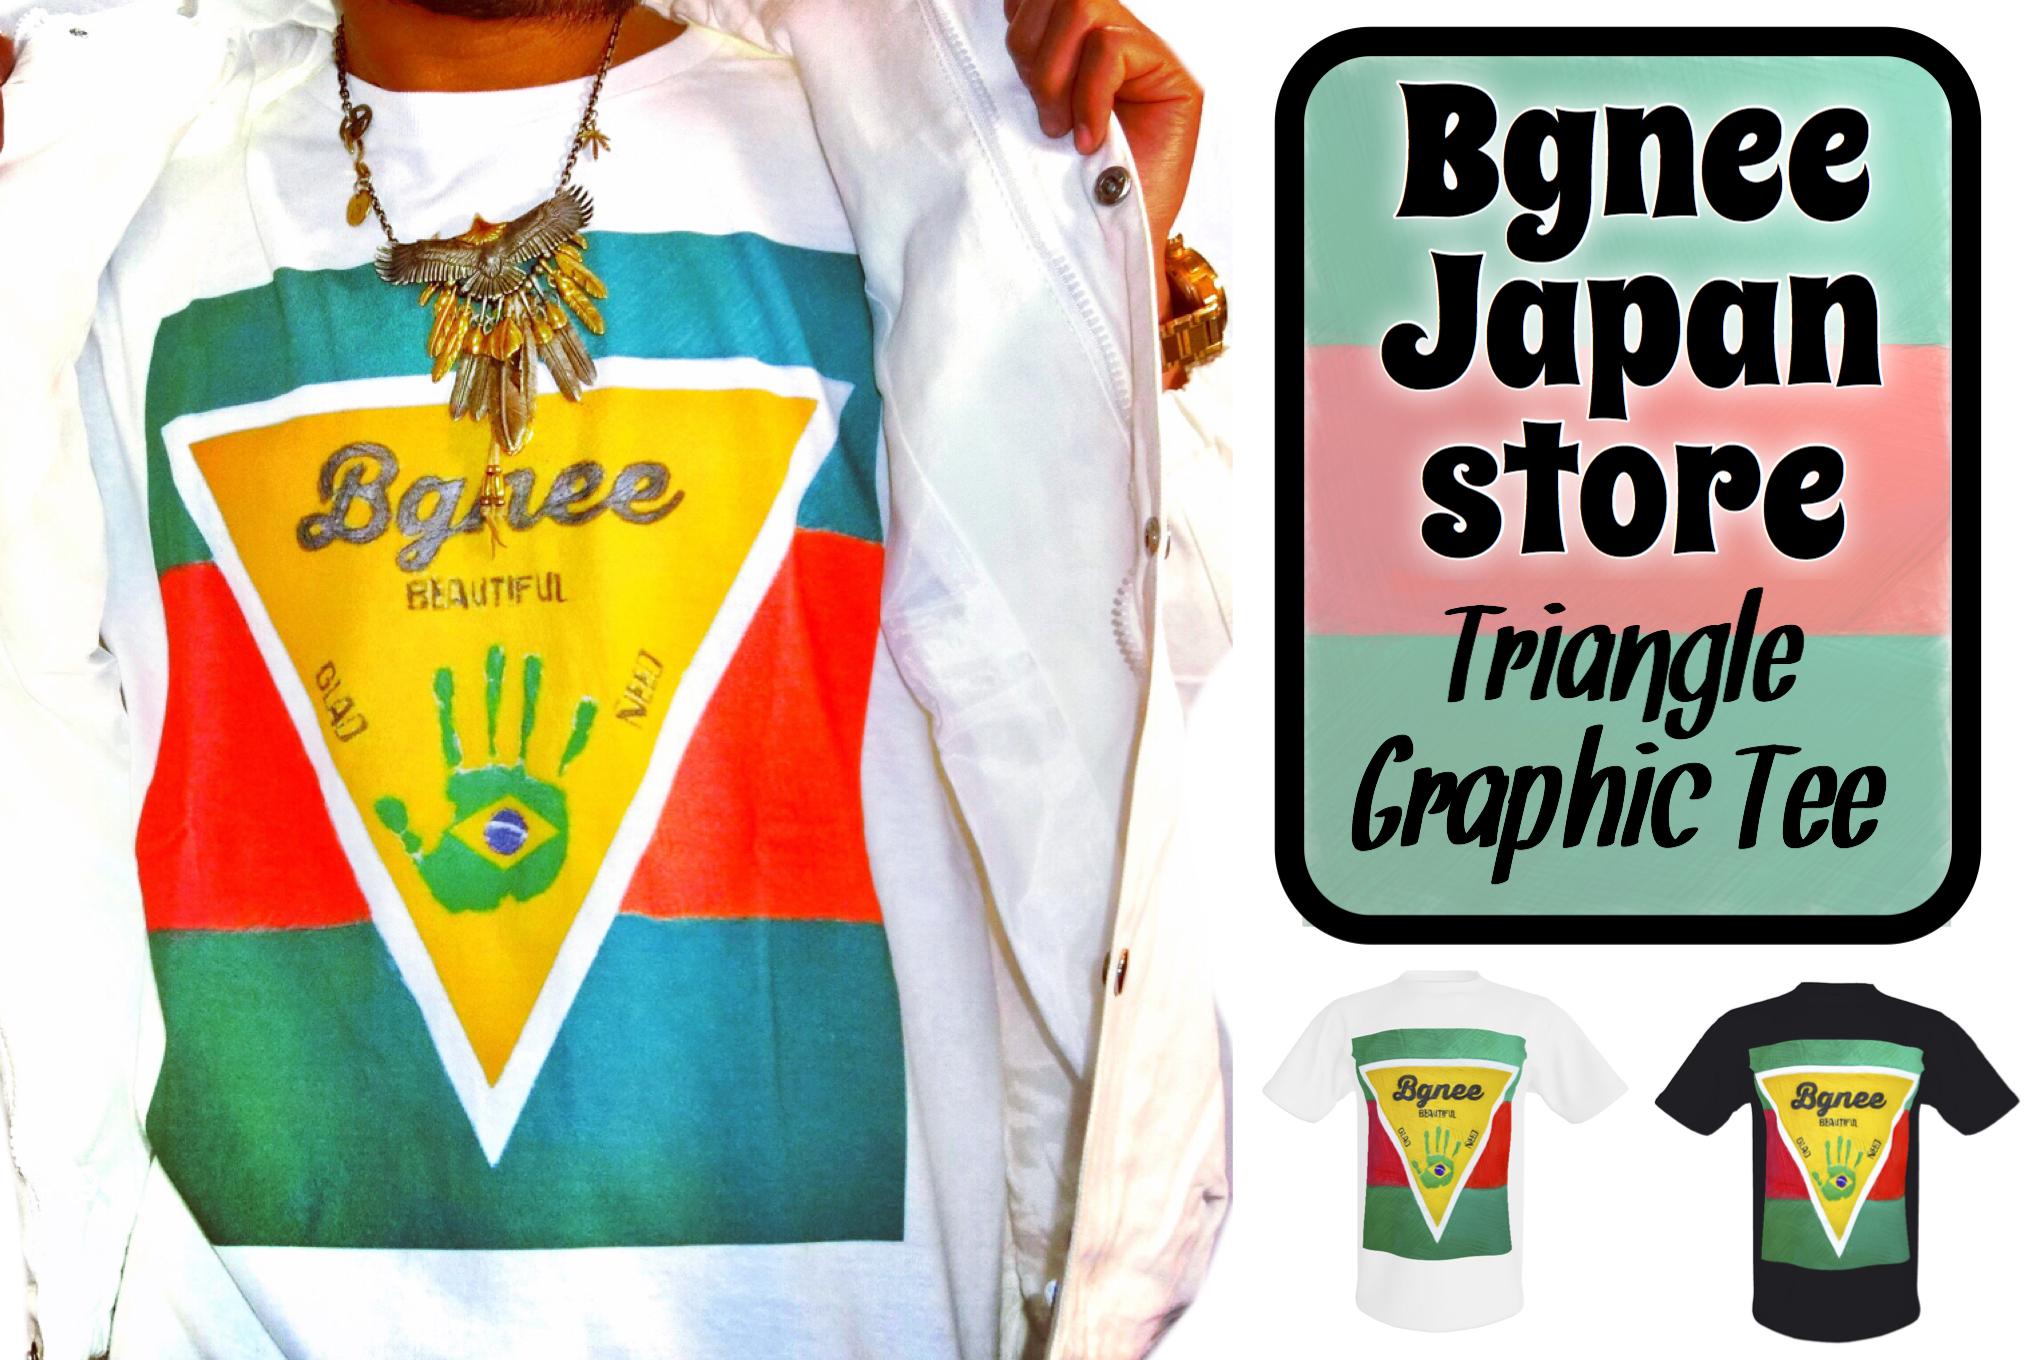 Bgnee triangle graphic Tee